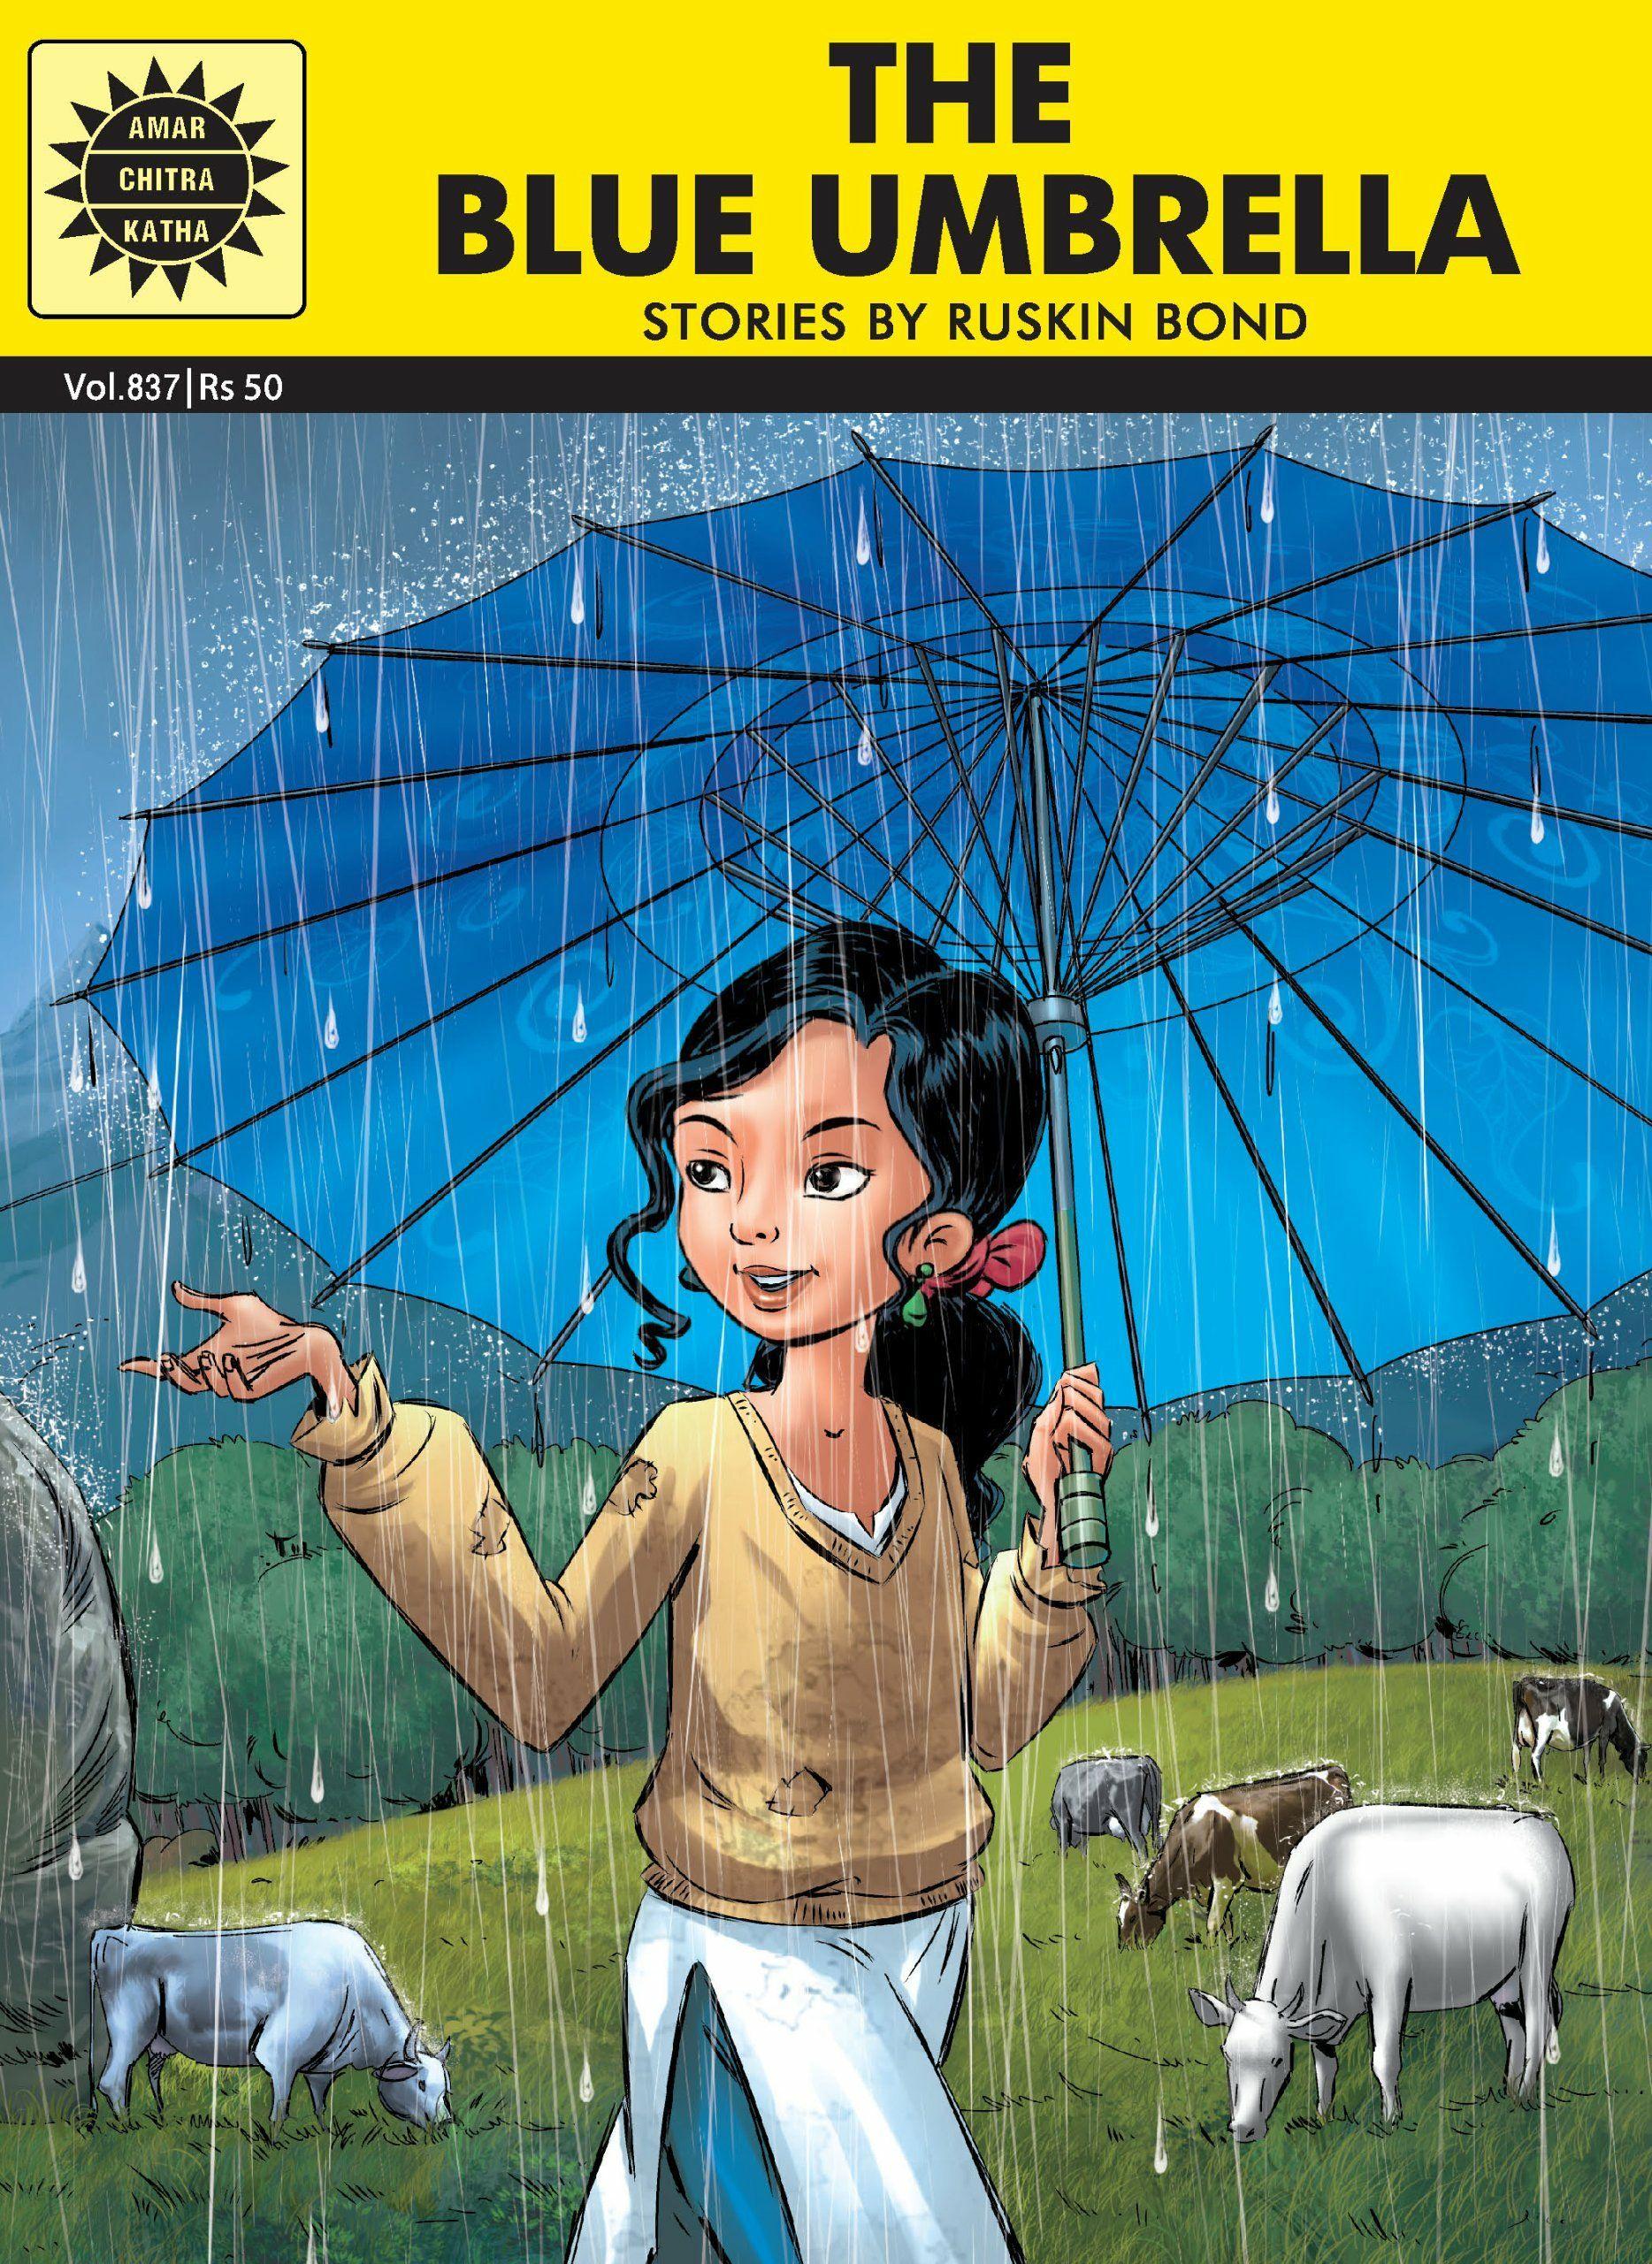 The Blue Umbrella By Ruskin Bond Snapshot Ruskin Bond Ruskin Bond Stories Blue Umbrella